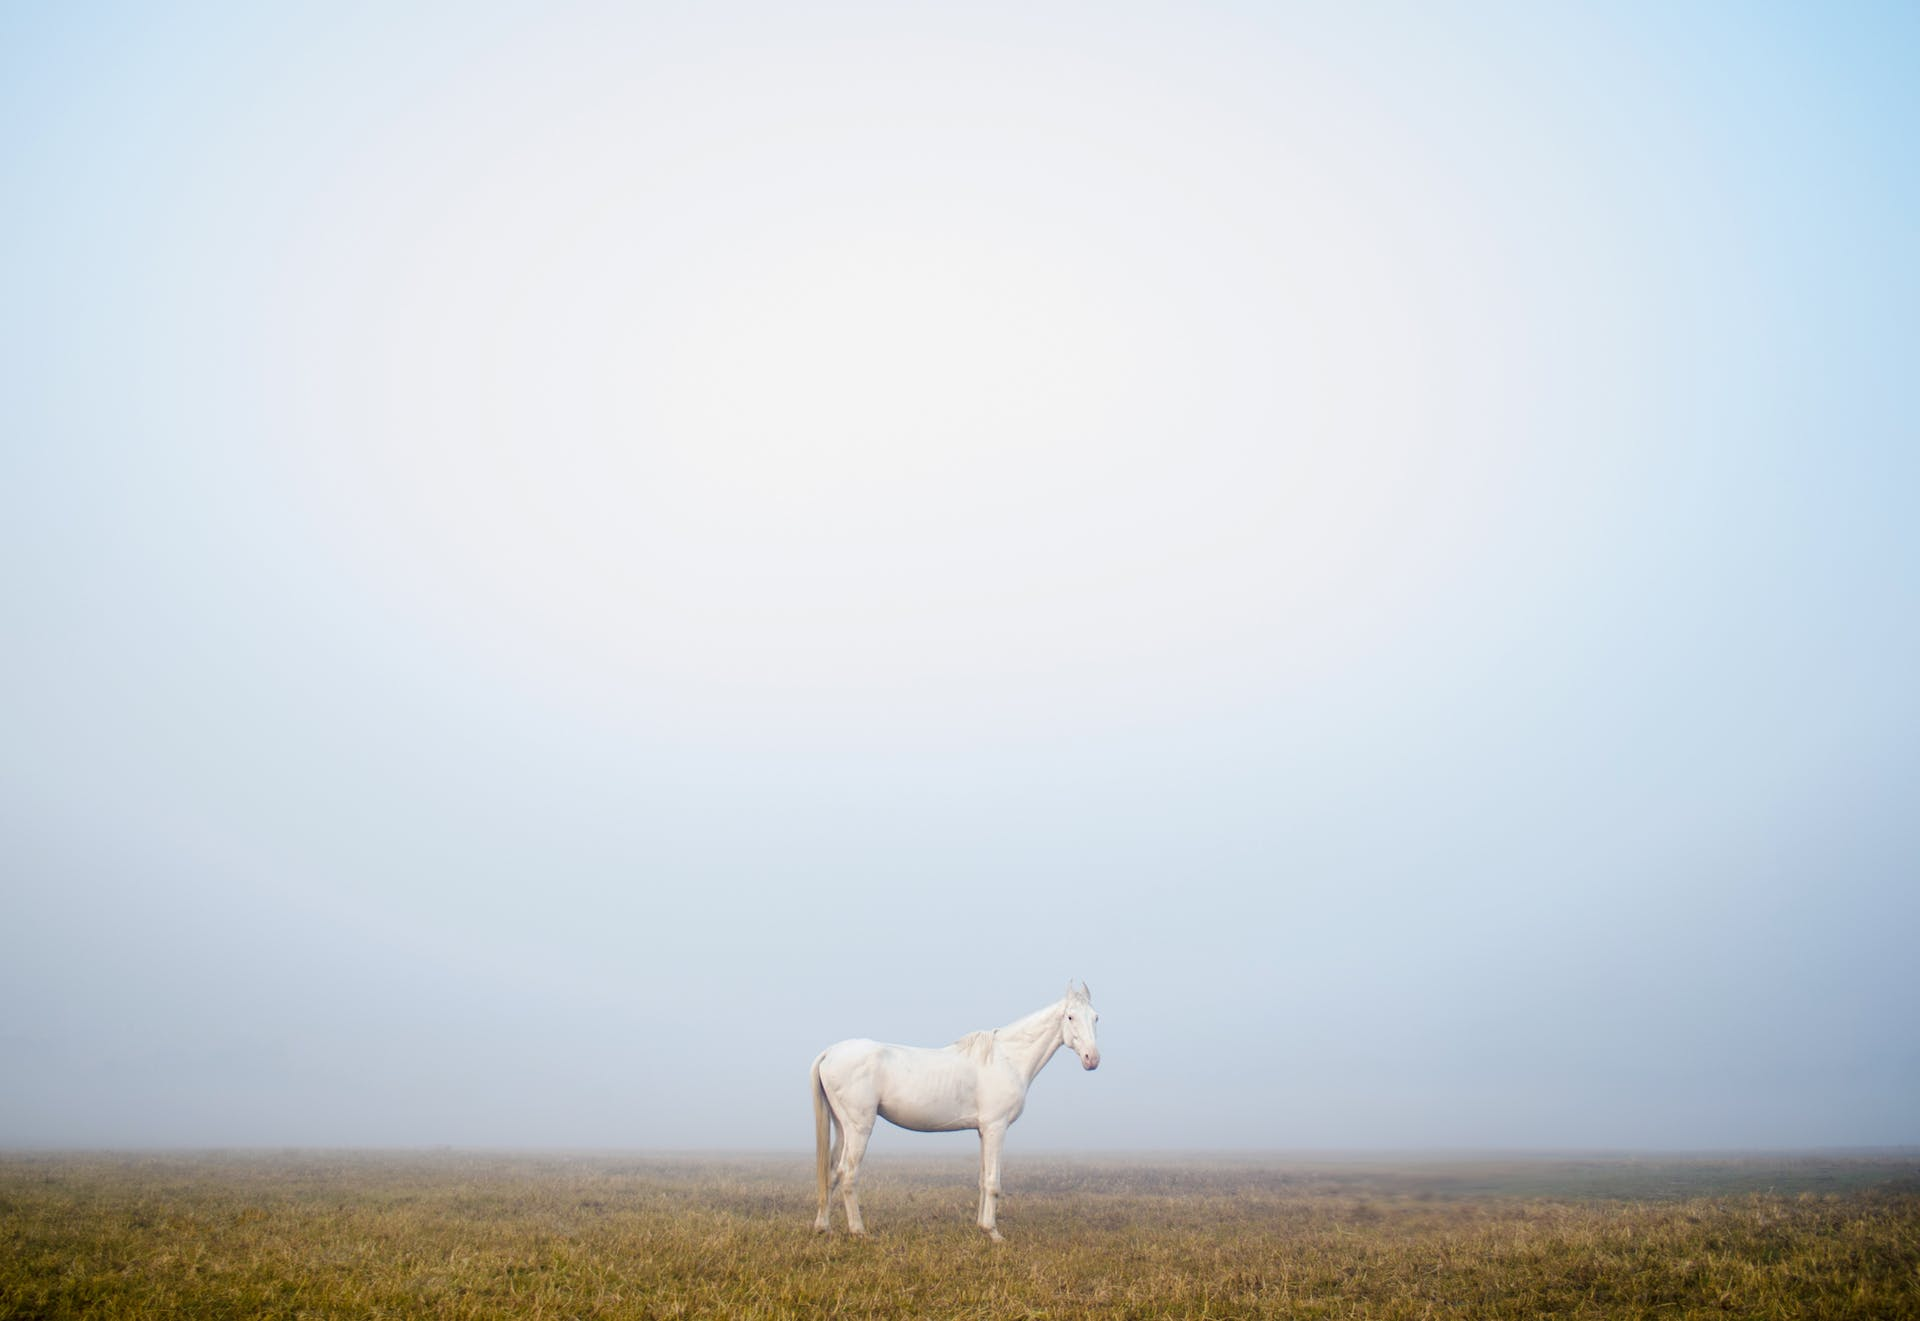 sell places peace fog best photo kolkata animals wildlife photography calm explore